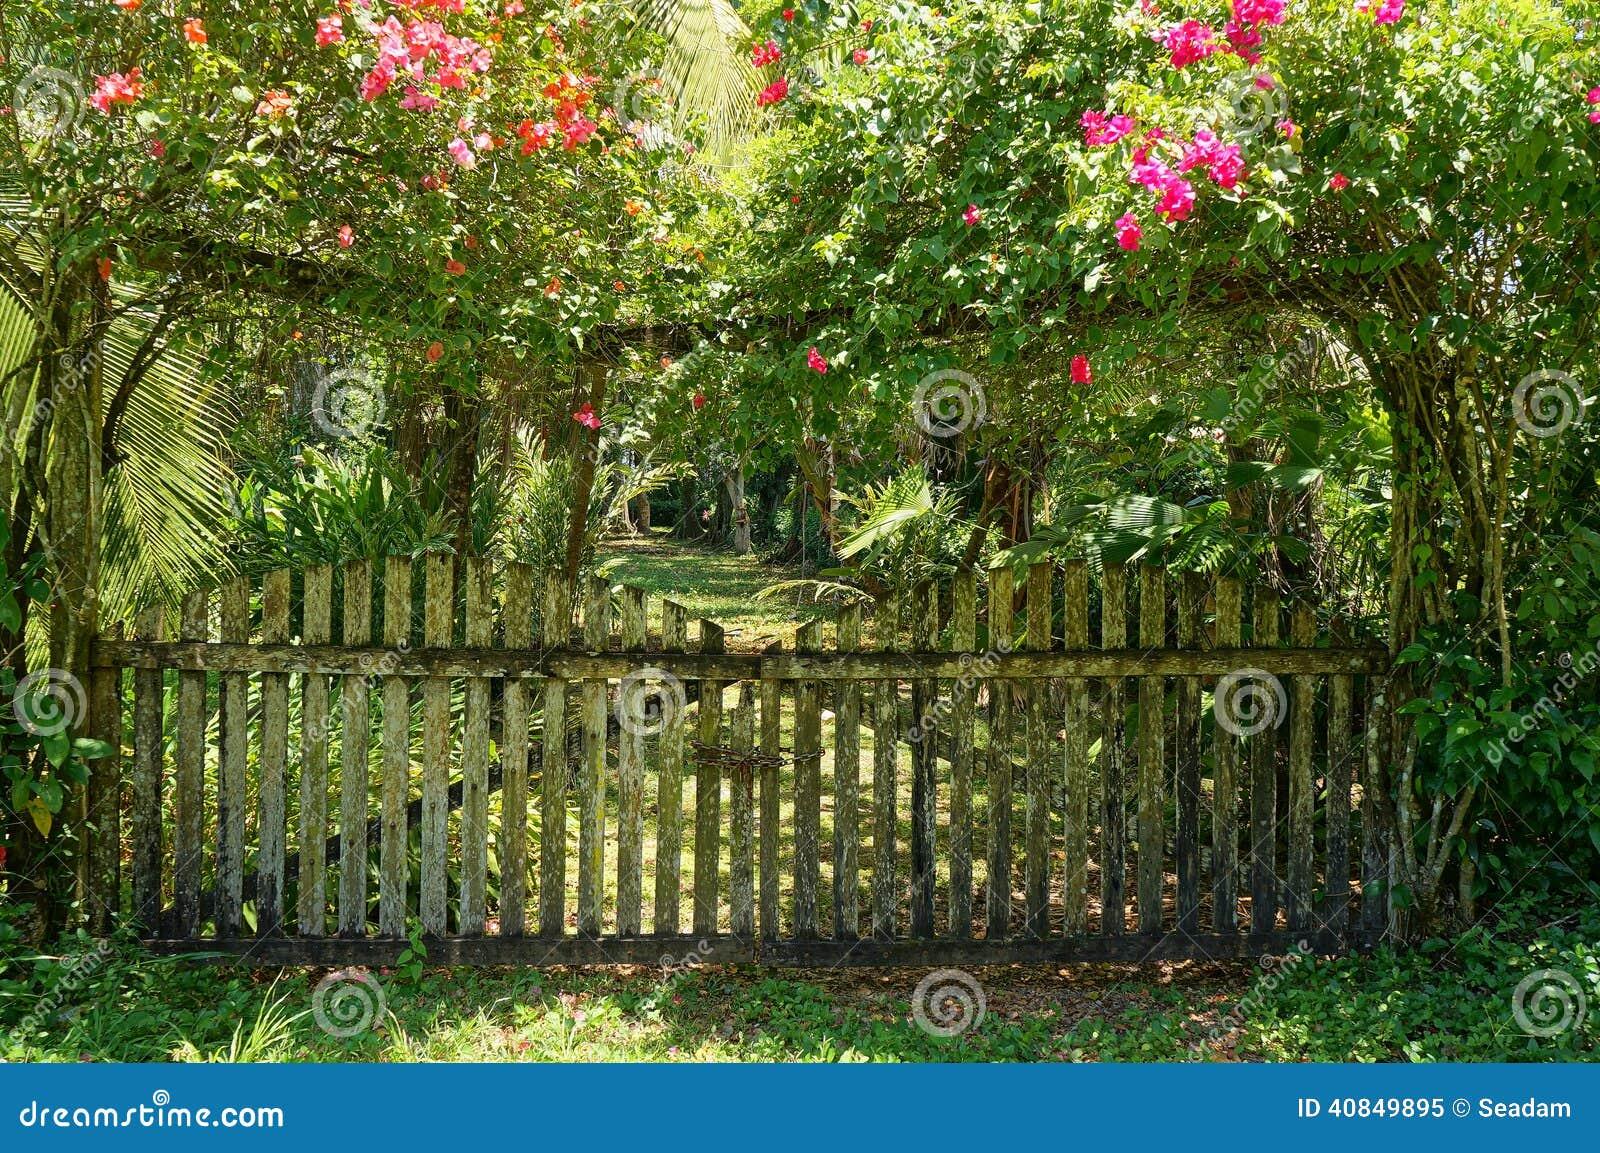 Old gate of tropical garden with bougainvillea stock photo image 40849895 - Fabriquer un porte outils de jardin ...